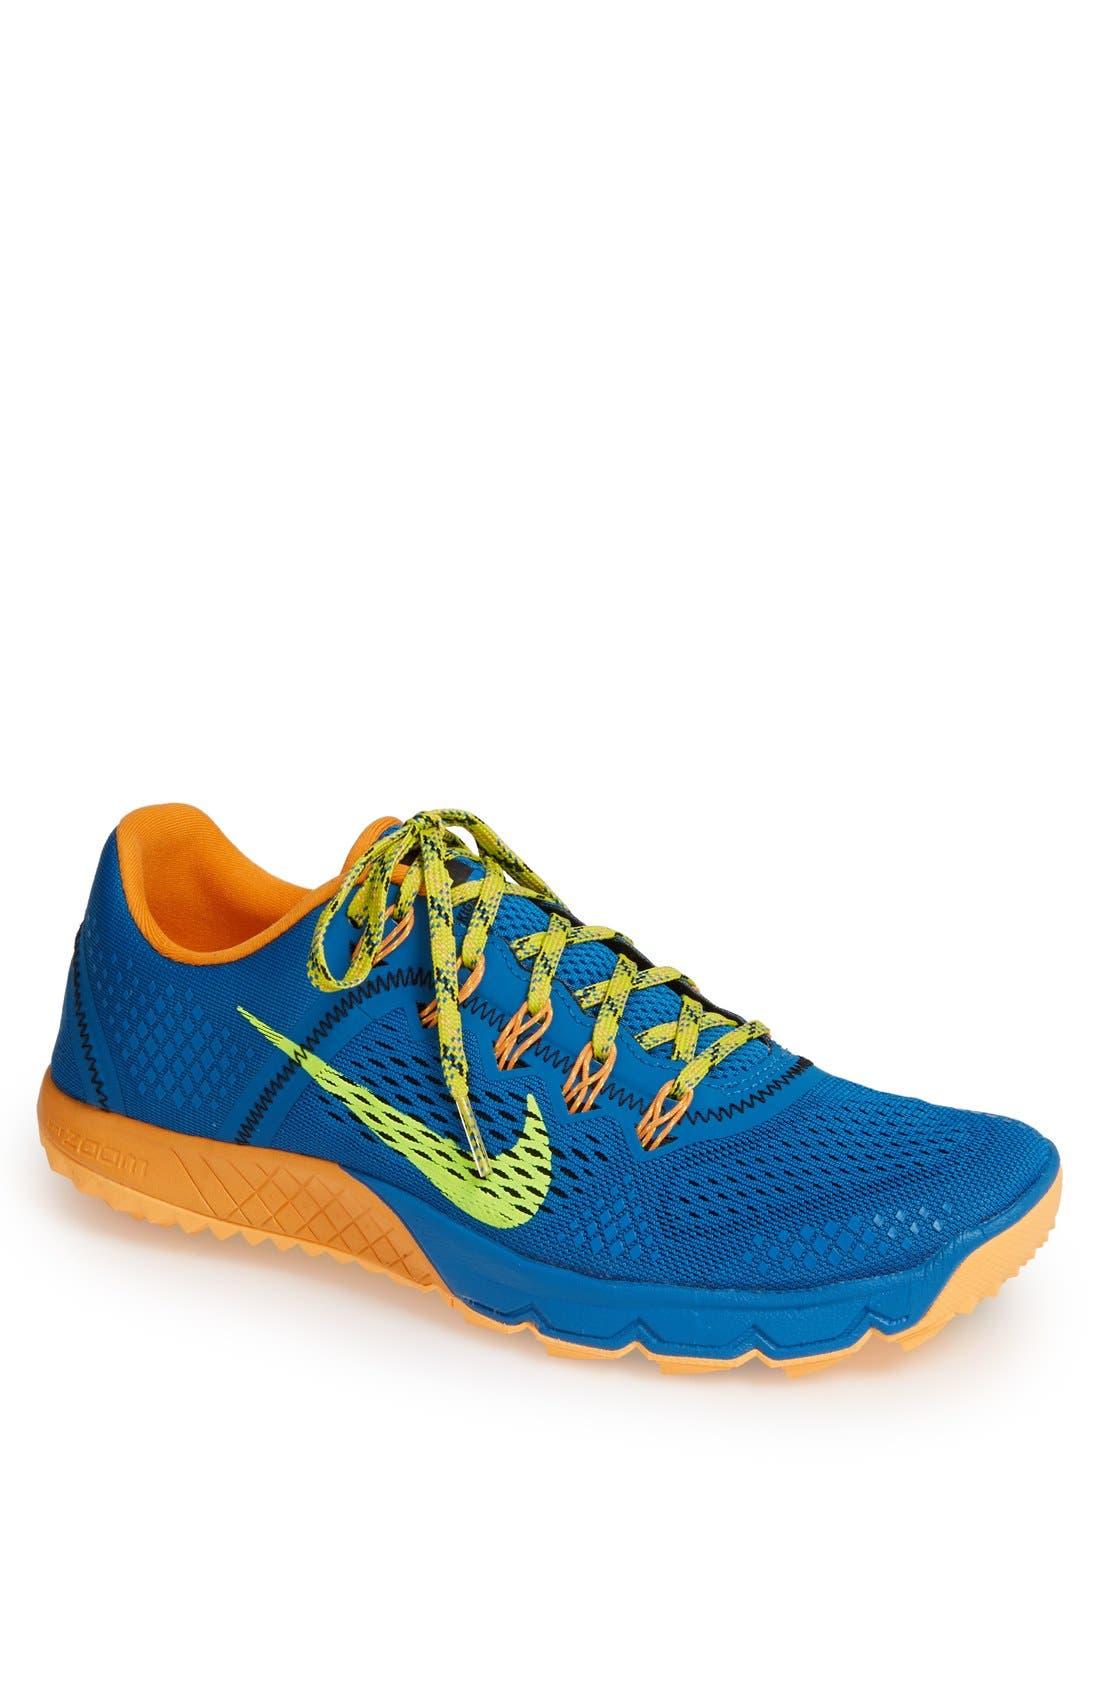 Alternate Image 1 Selected - Nike 'Zoom Terra Kiger' Trail Running Shoe (Men)